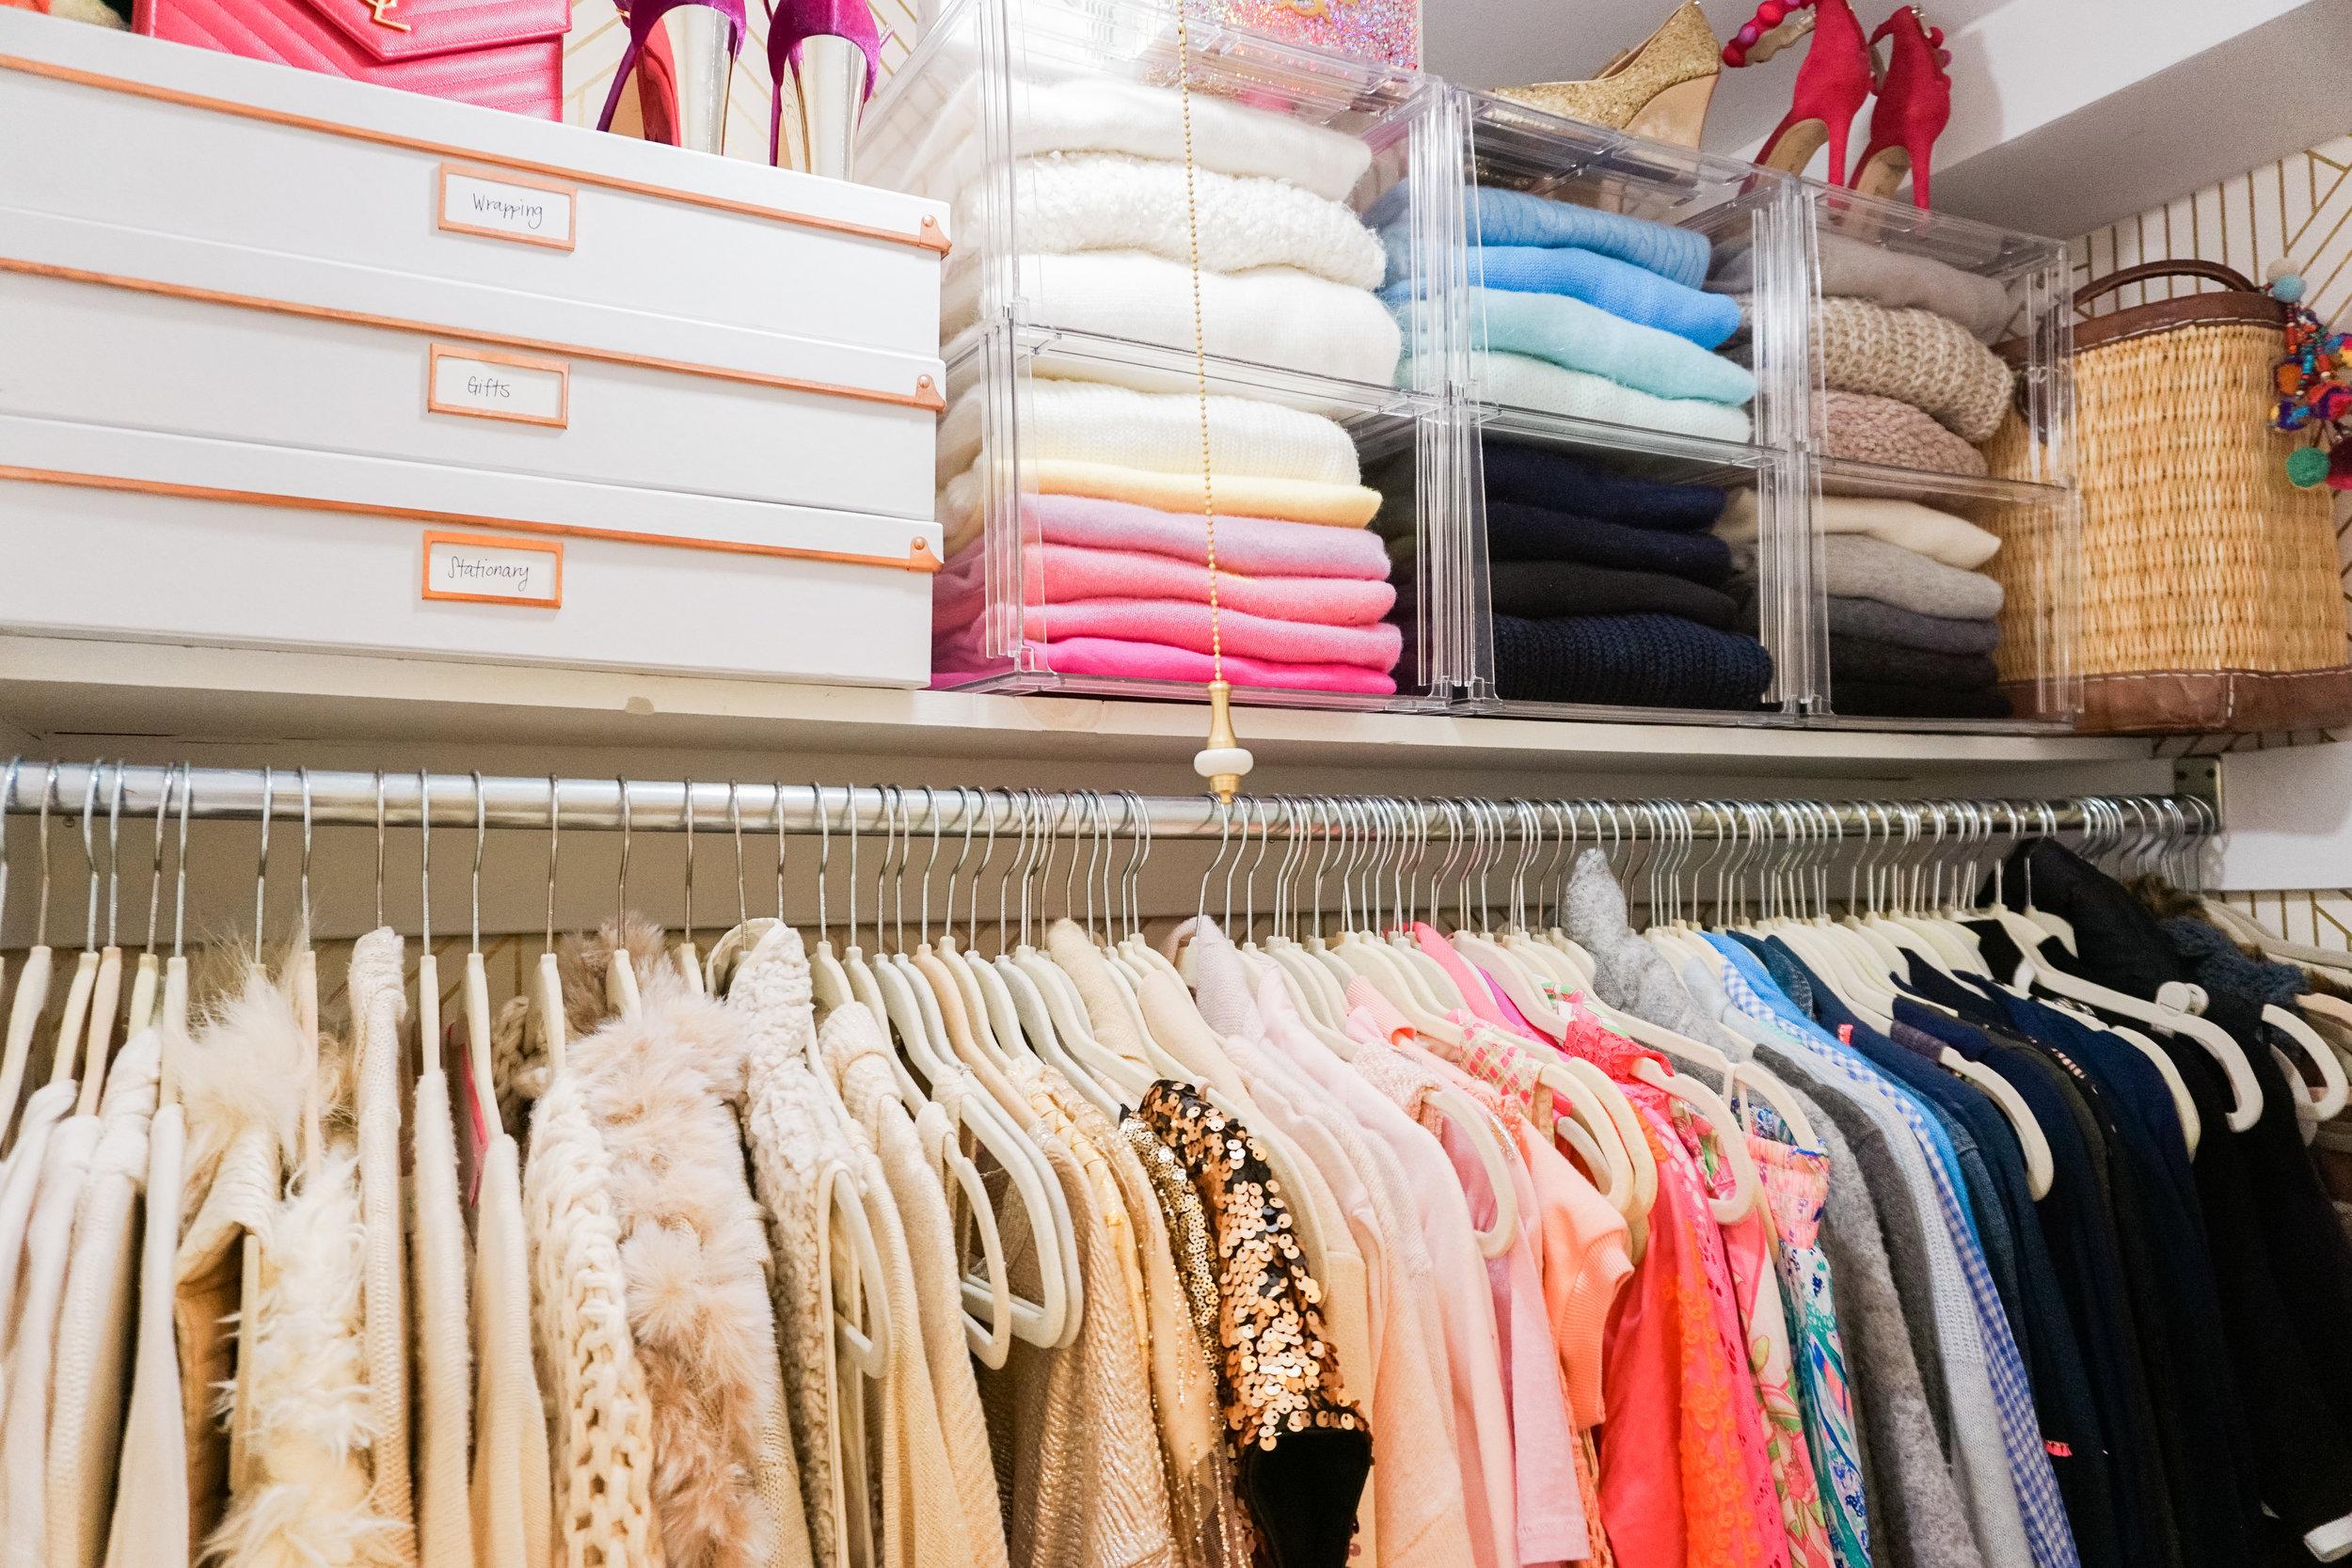 Closet organization top shelf after